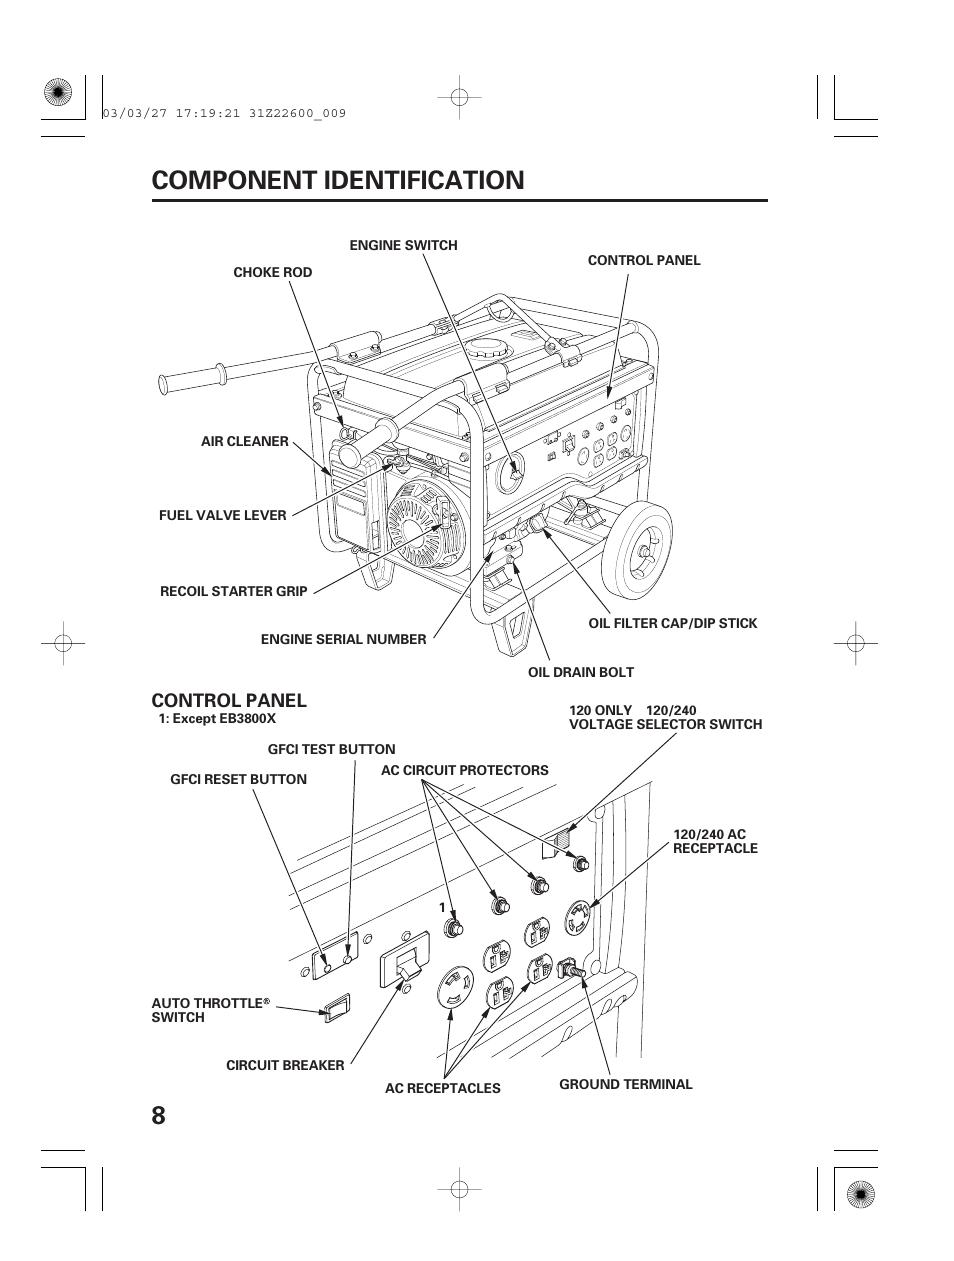 Component identification, Control panel, 8component